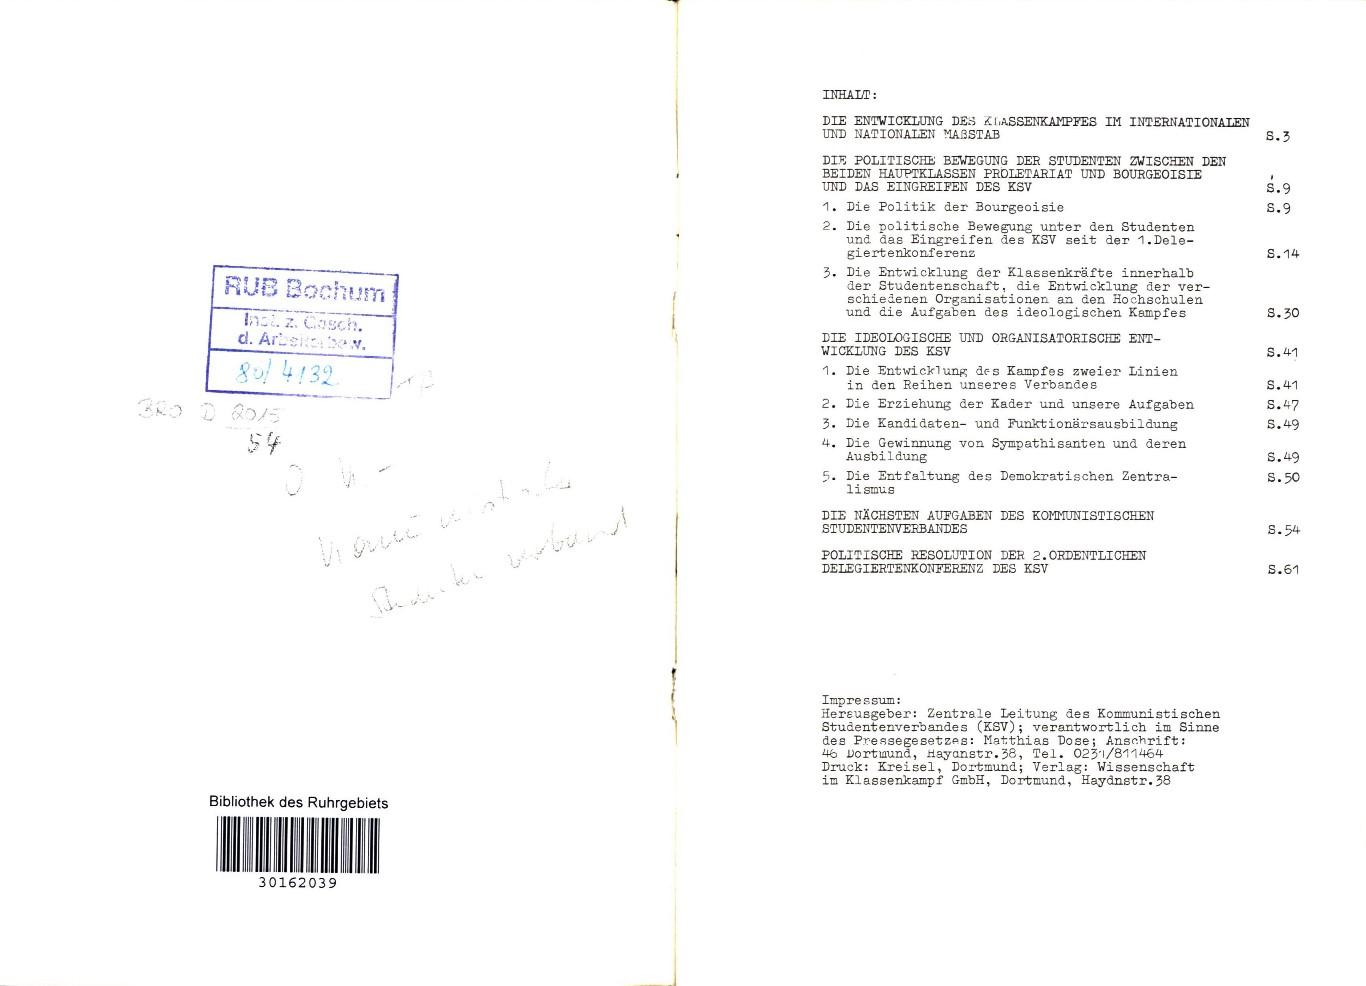 KSV_1974_Rechenschaftsbericht_02